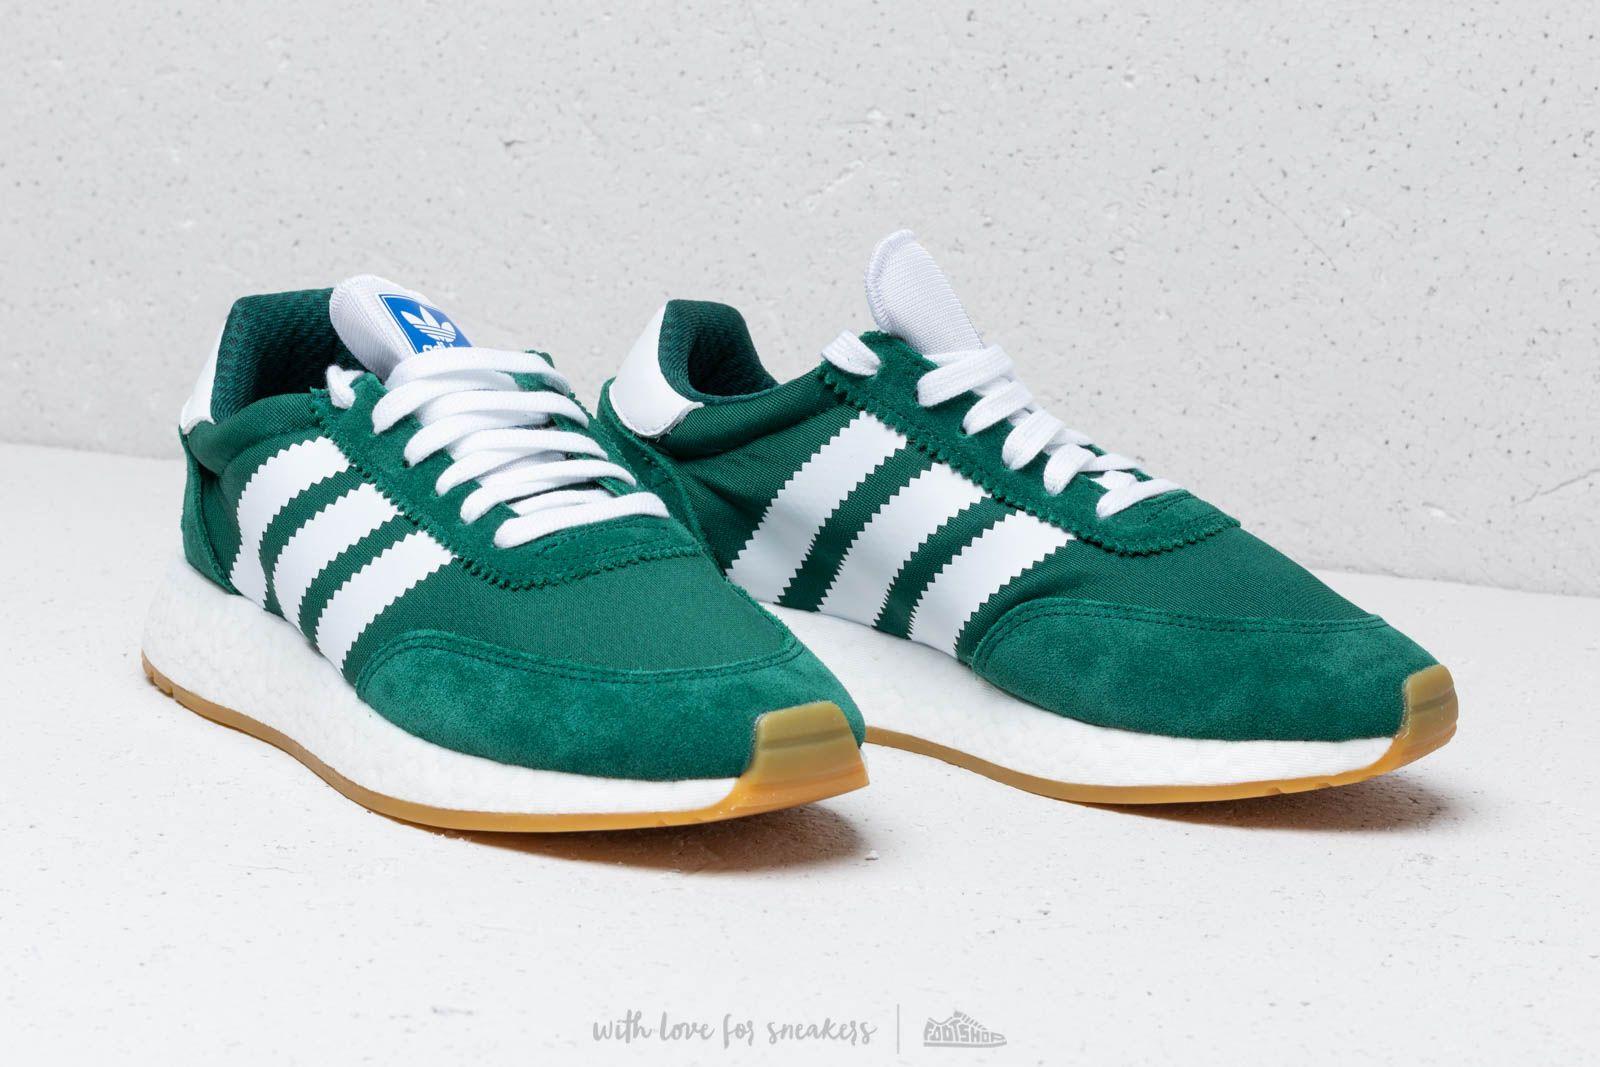 GumFootshop Cloud Collegiate White Green W adidas I 5923 vwn0y8OPmN